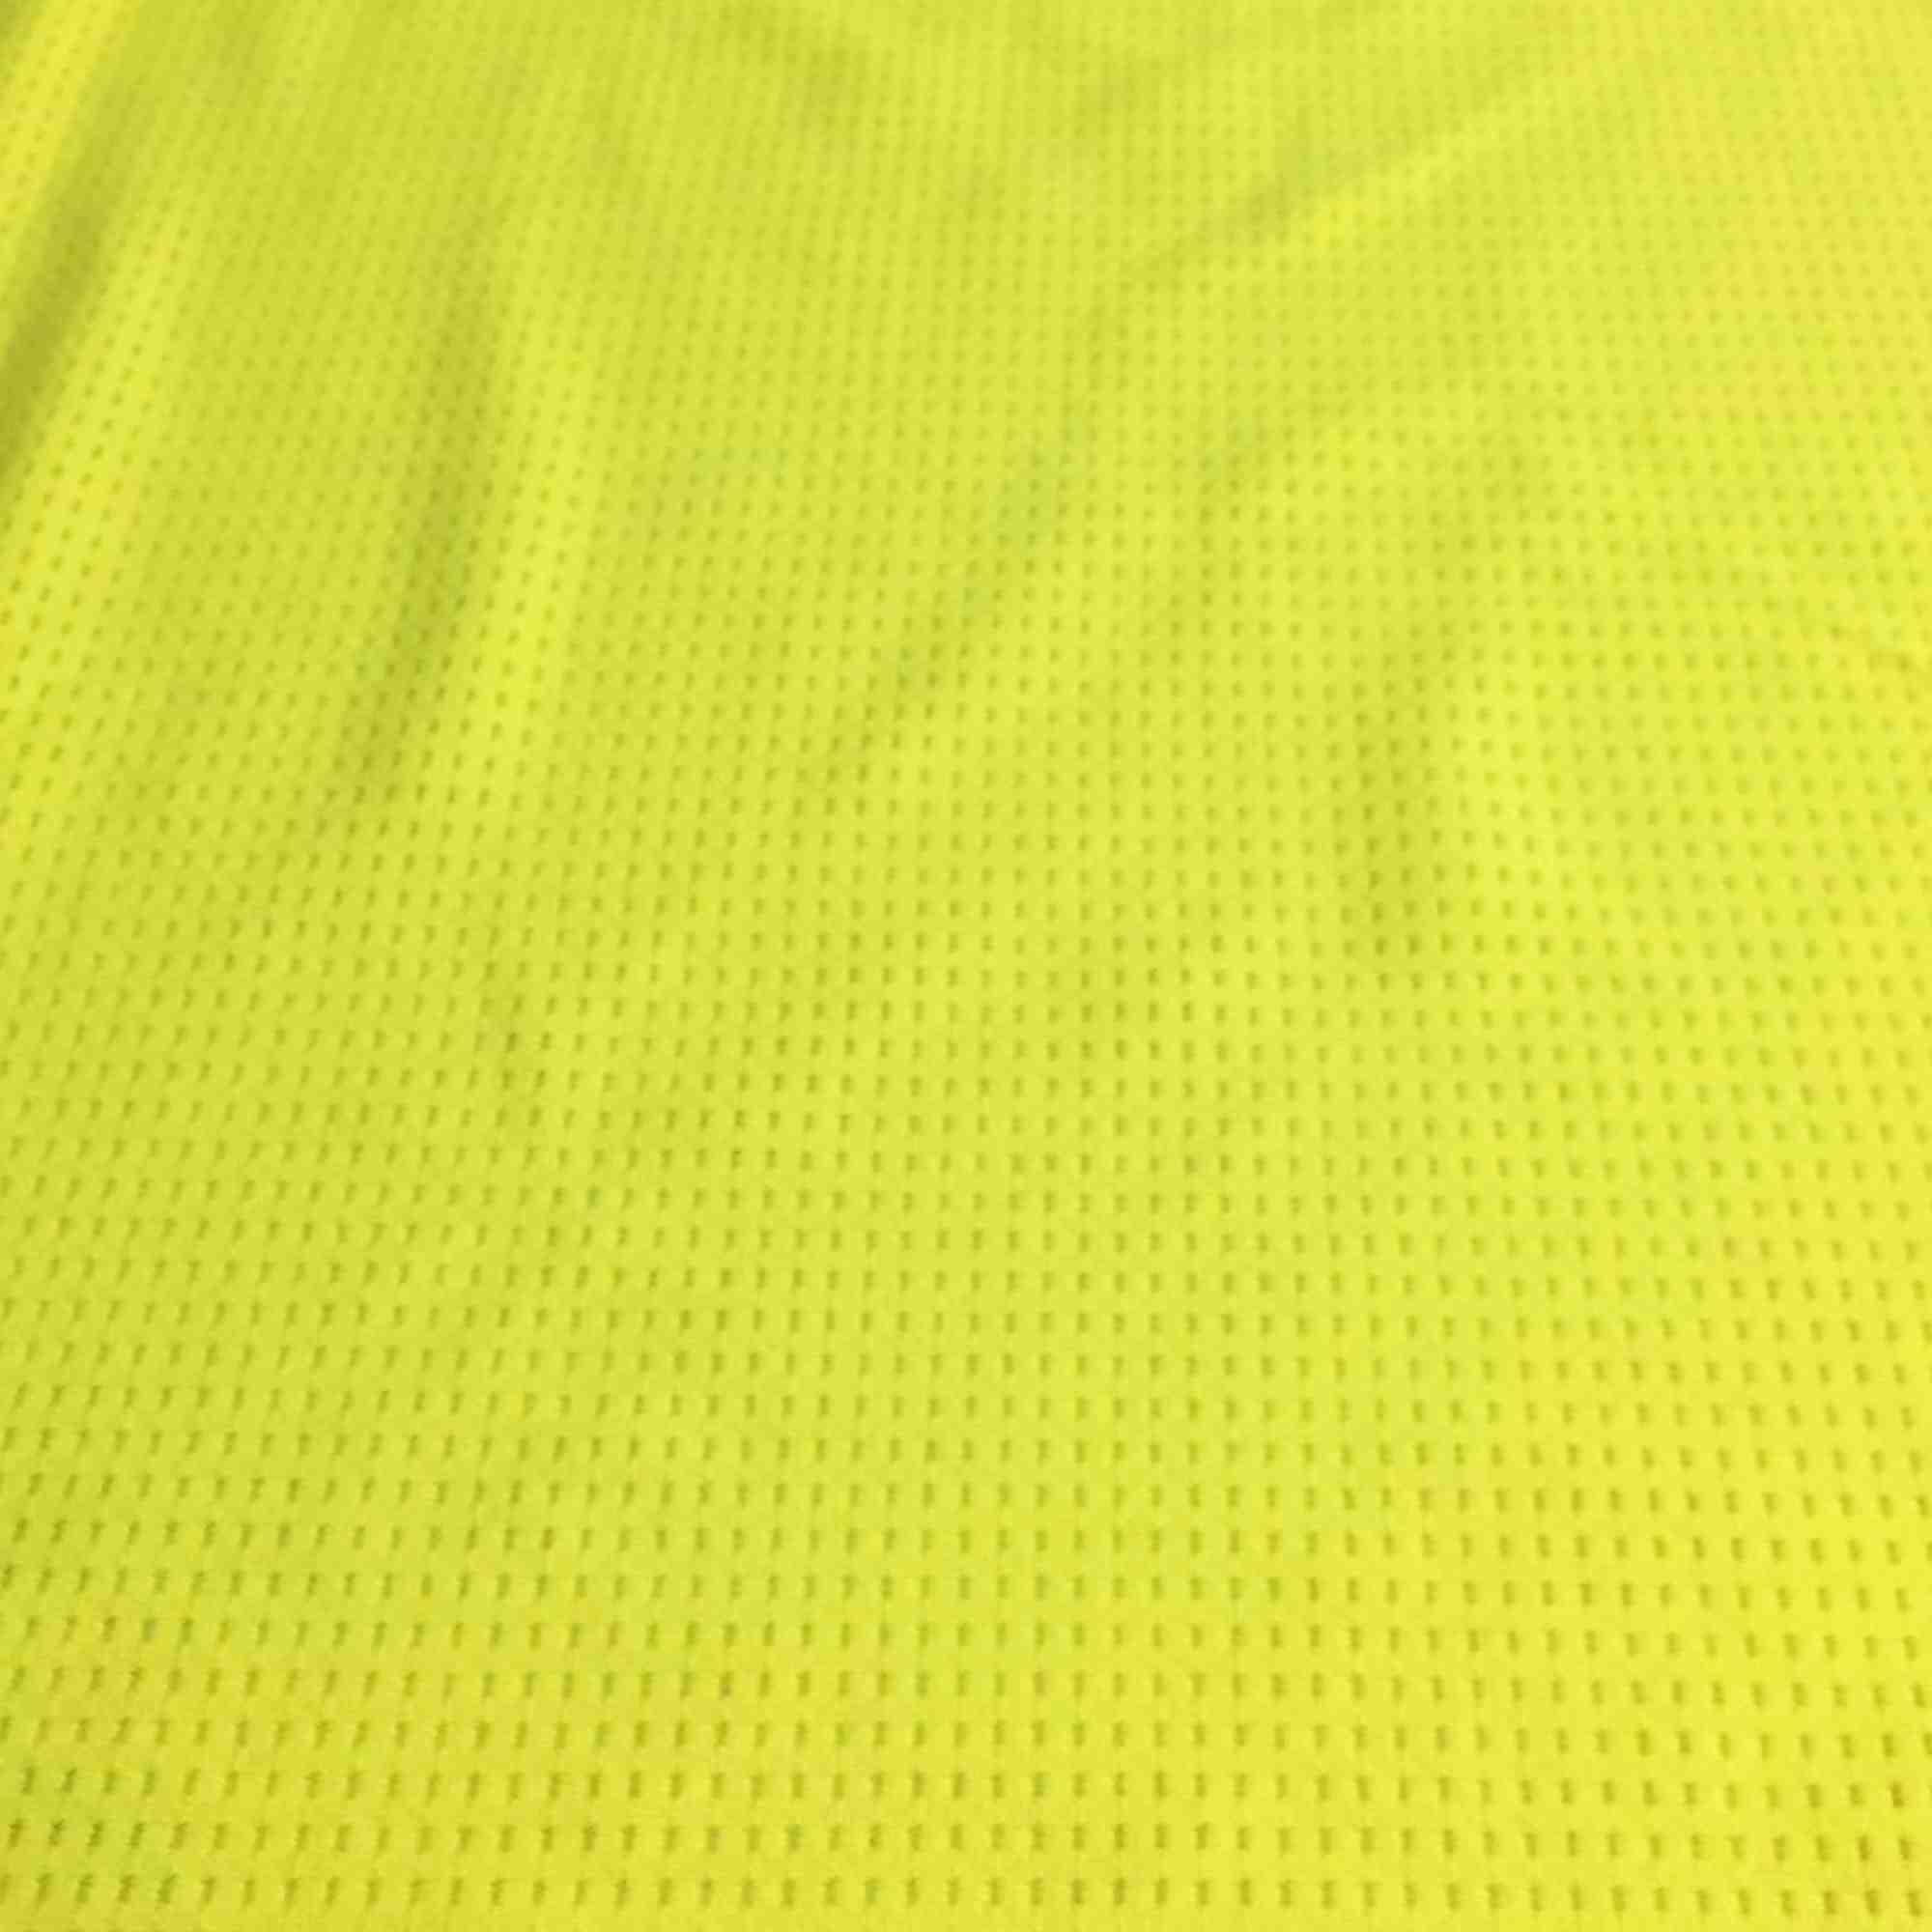 Tela Max Dry Amarelo Neon